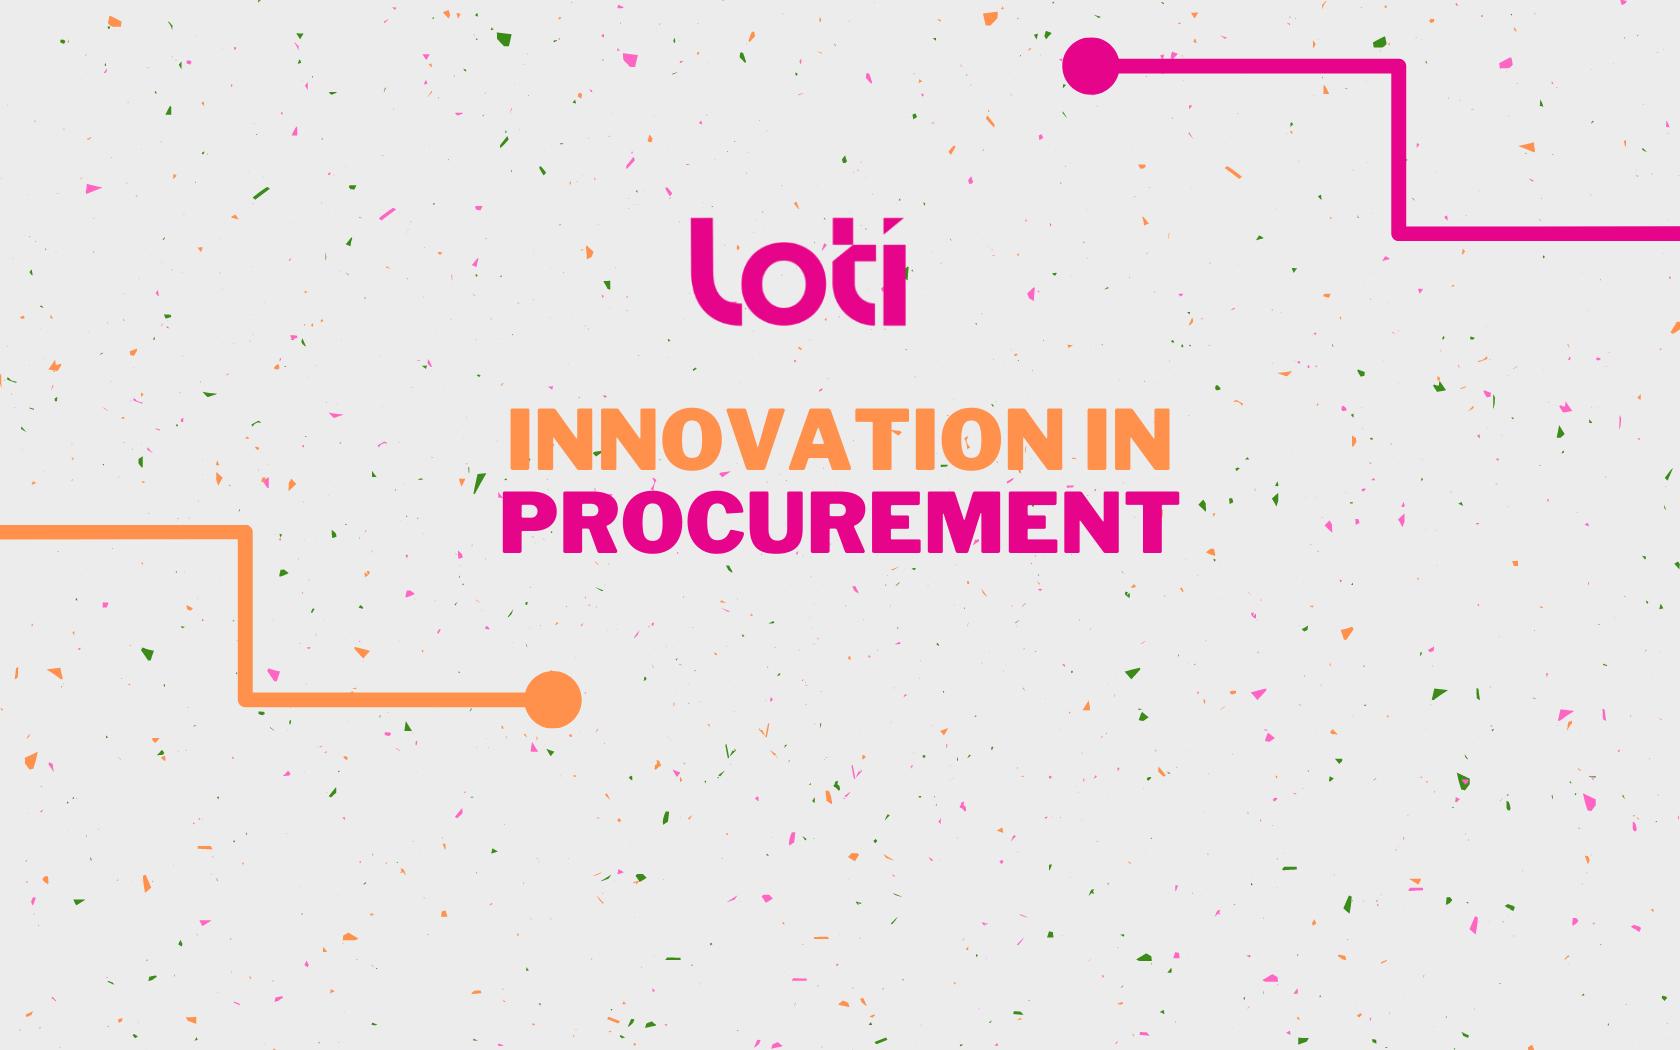 LOTI Innovation in Procurement